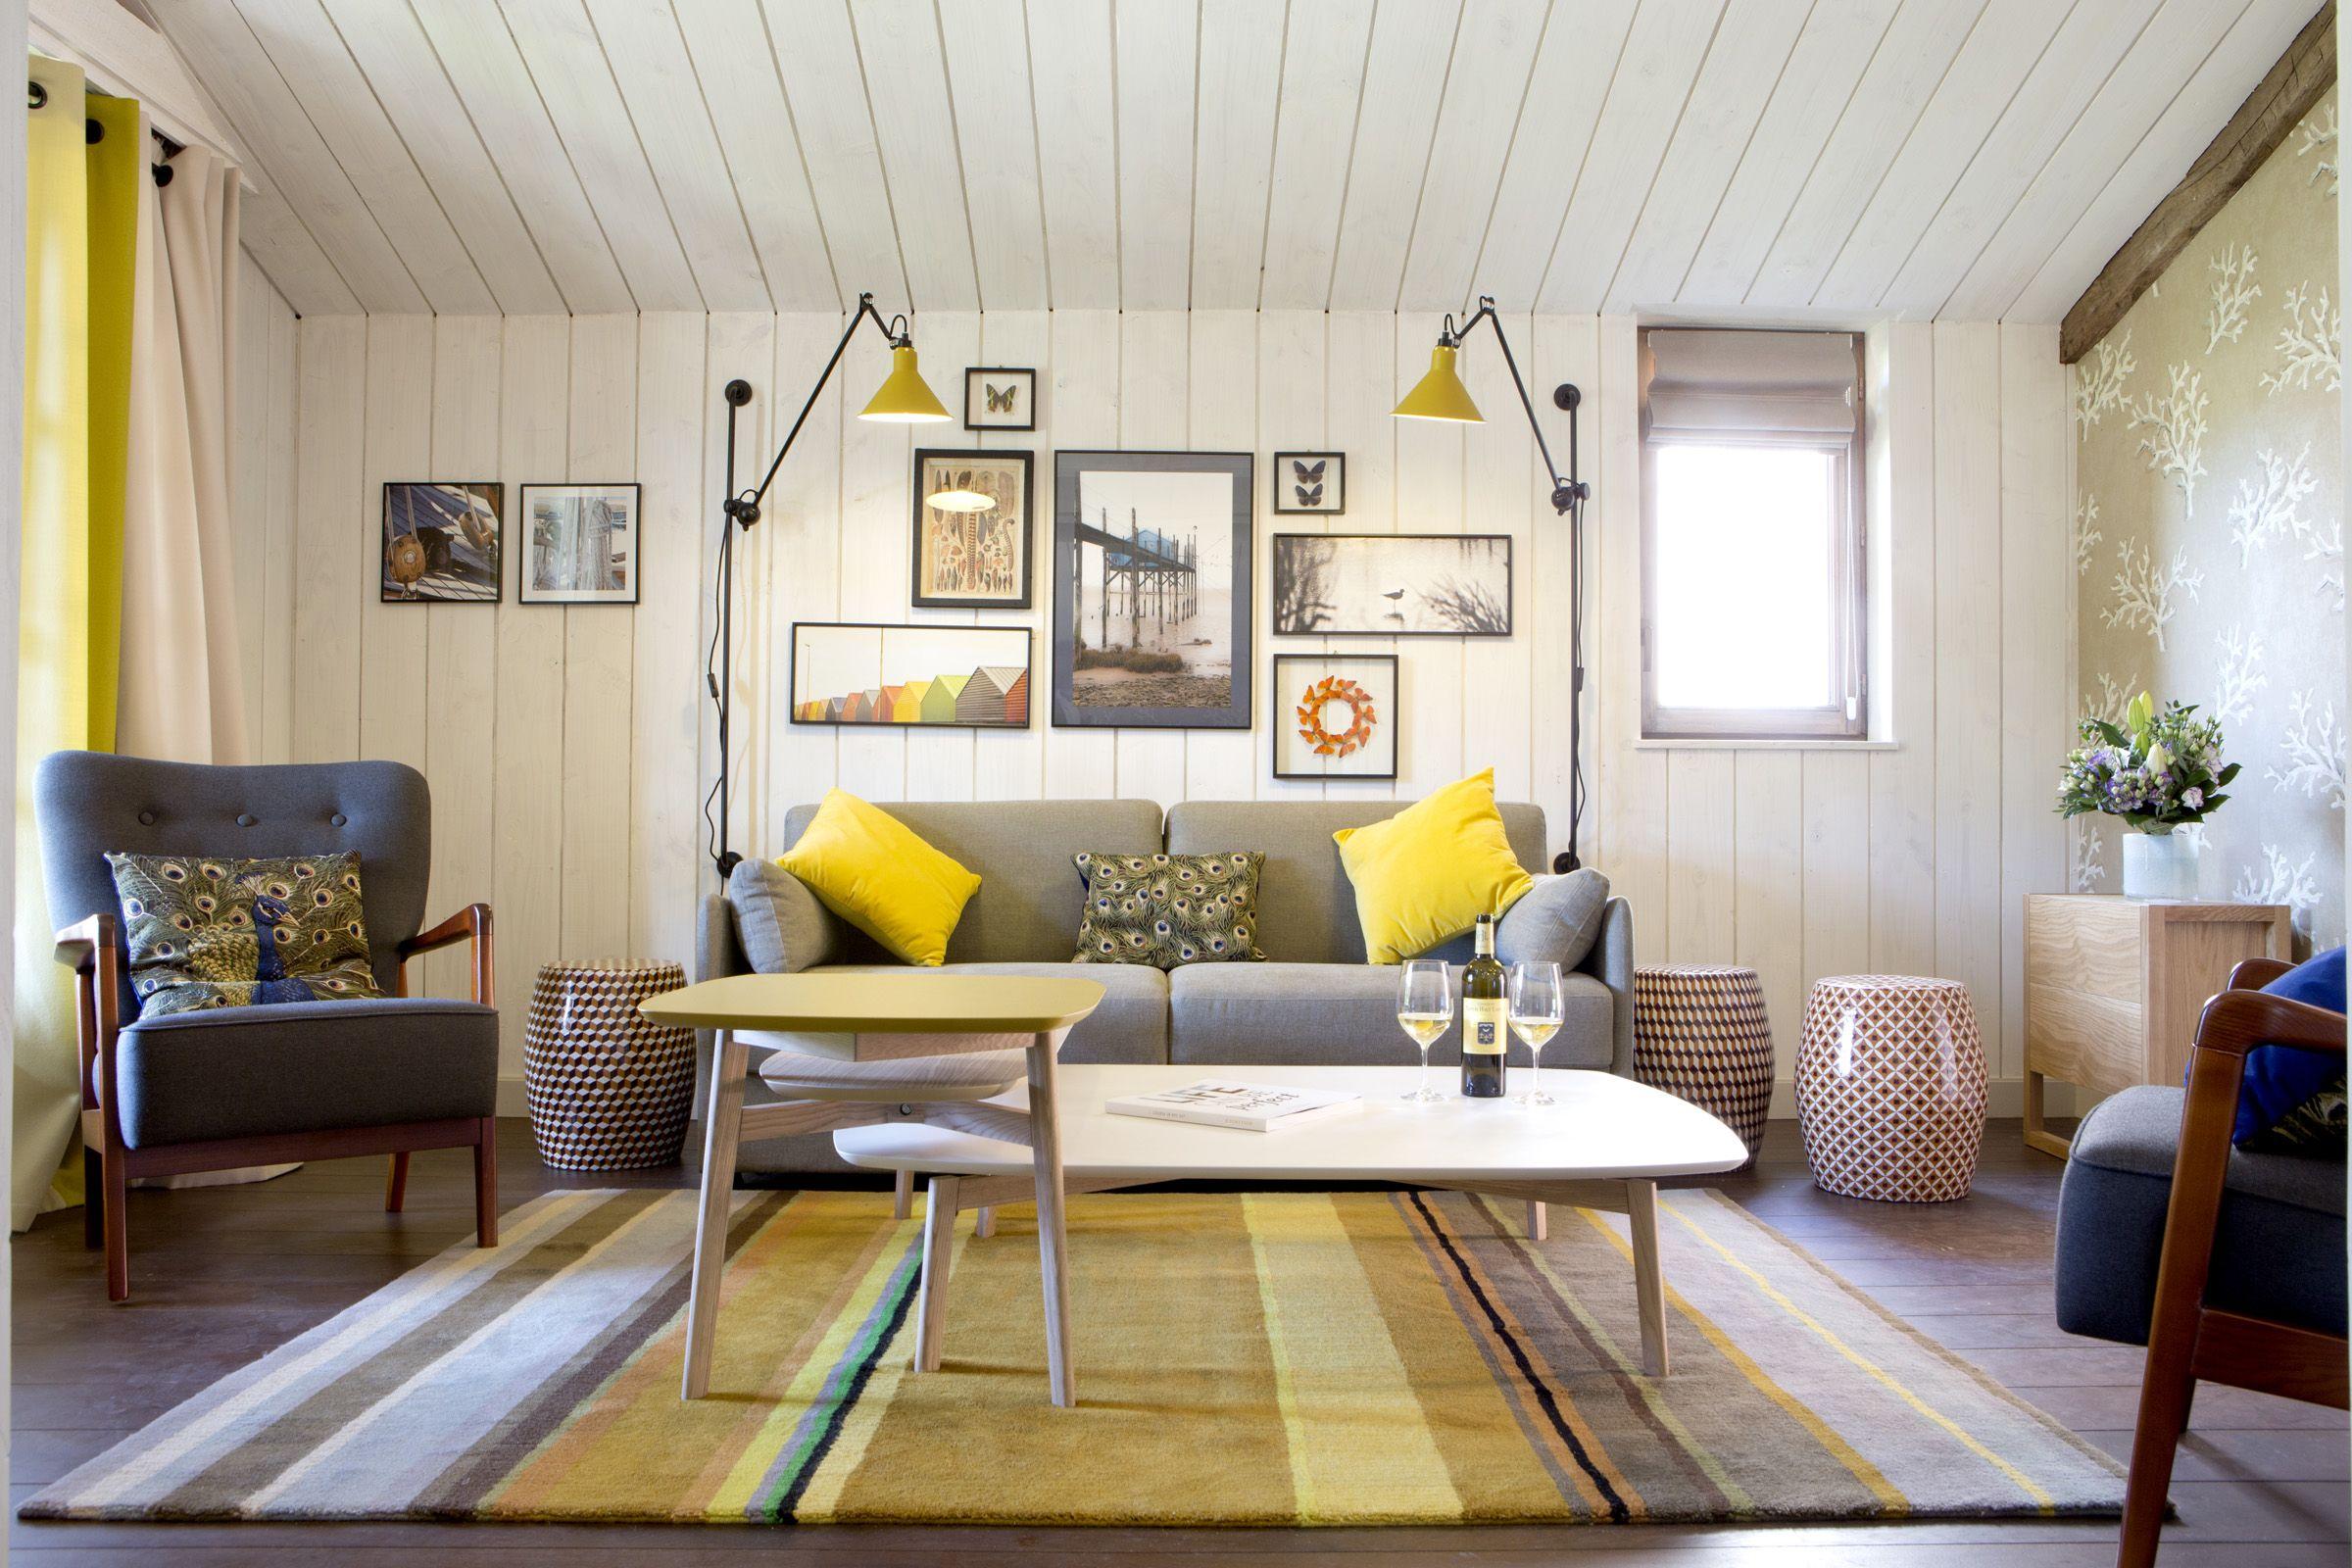 Deco salon gris blanc jaune recherche google id es for Recherche idee deco